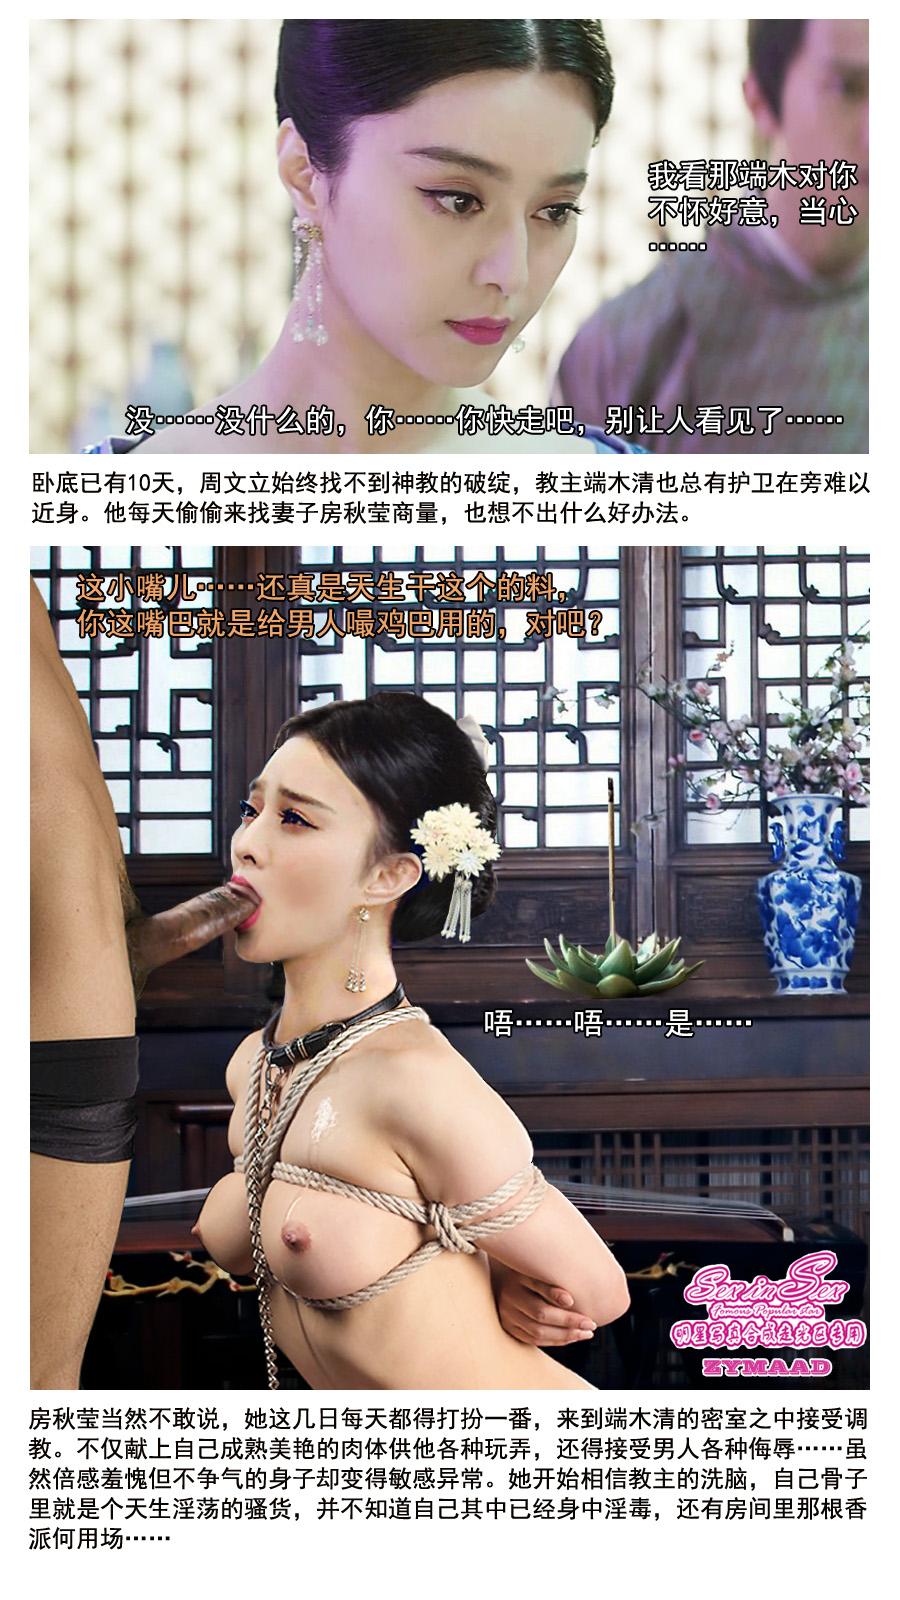 Sexinsex 极乐神教 nude ja.photo-image.monster